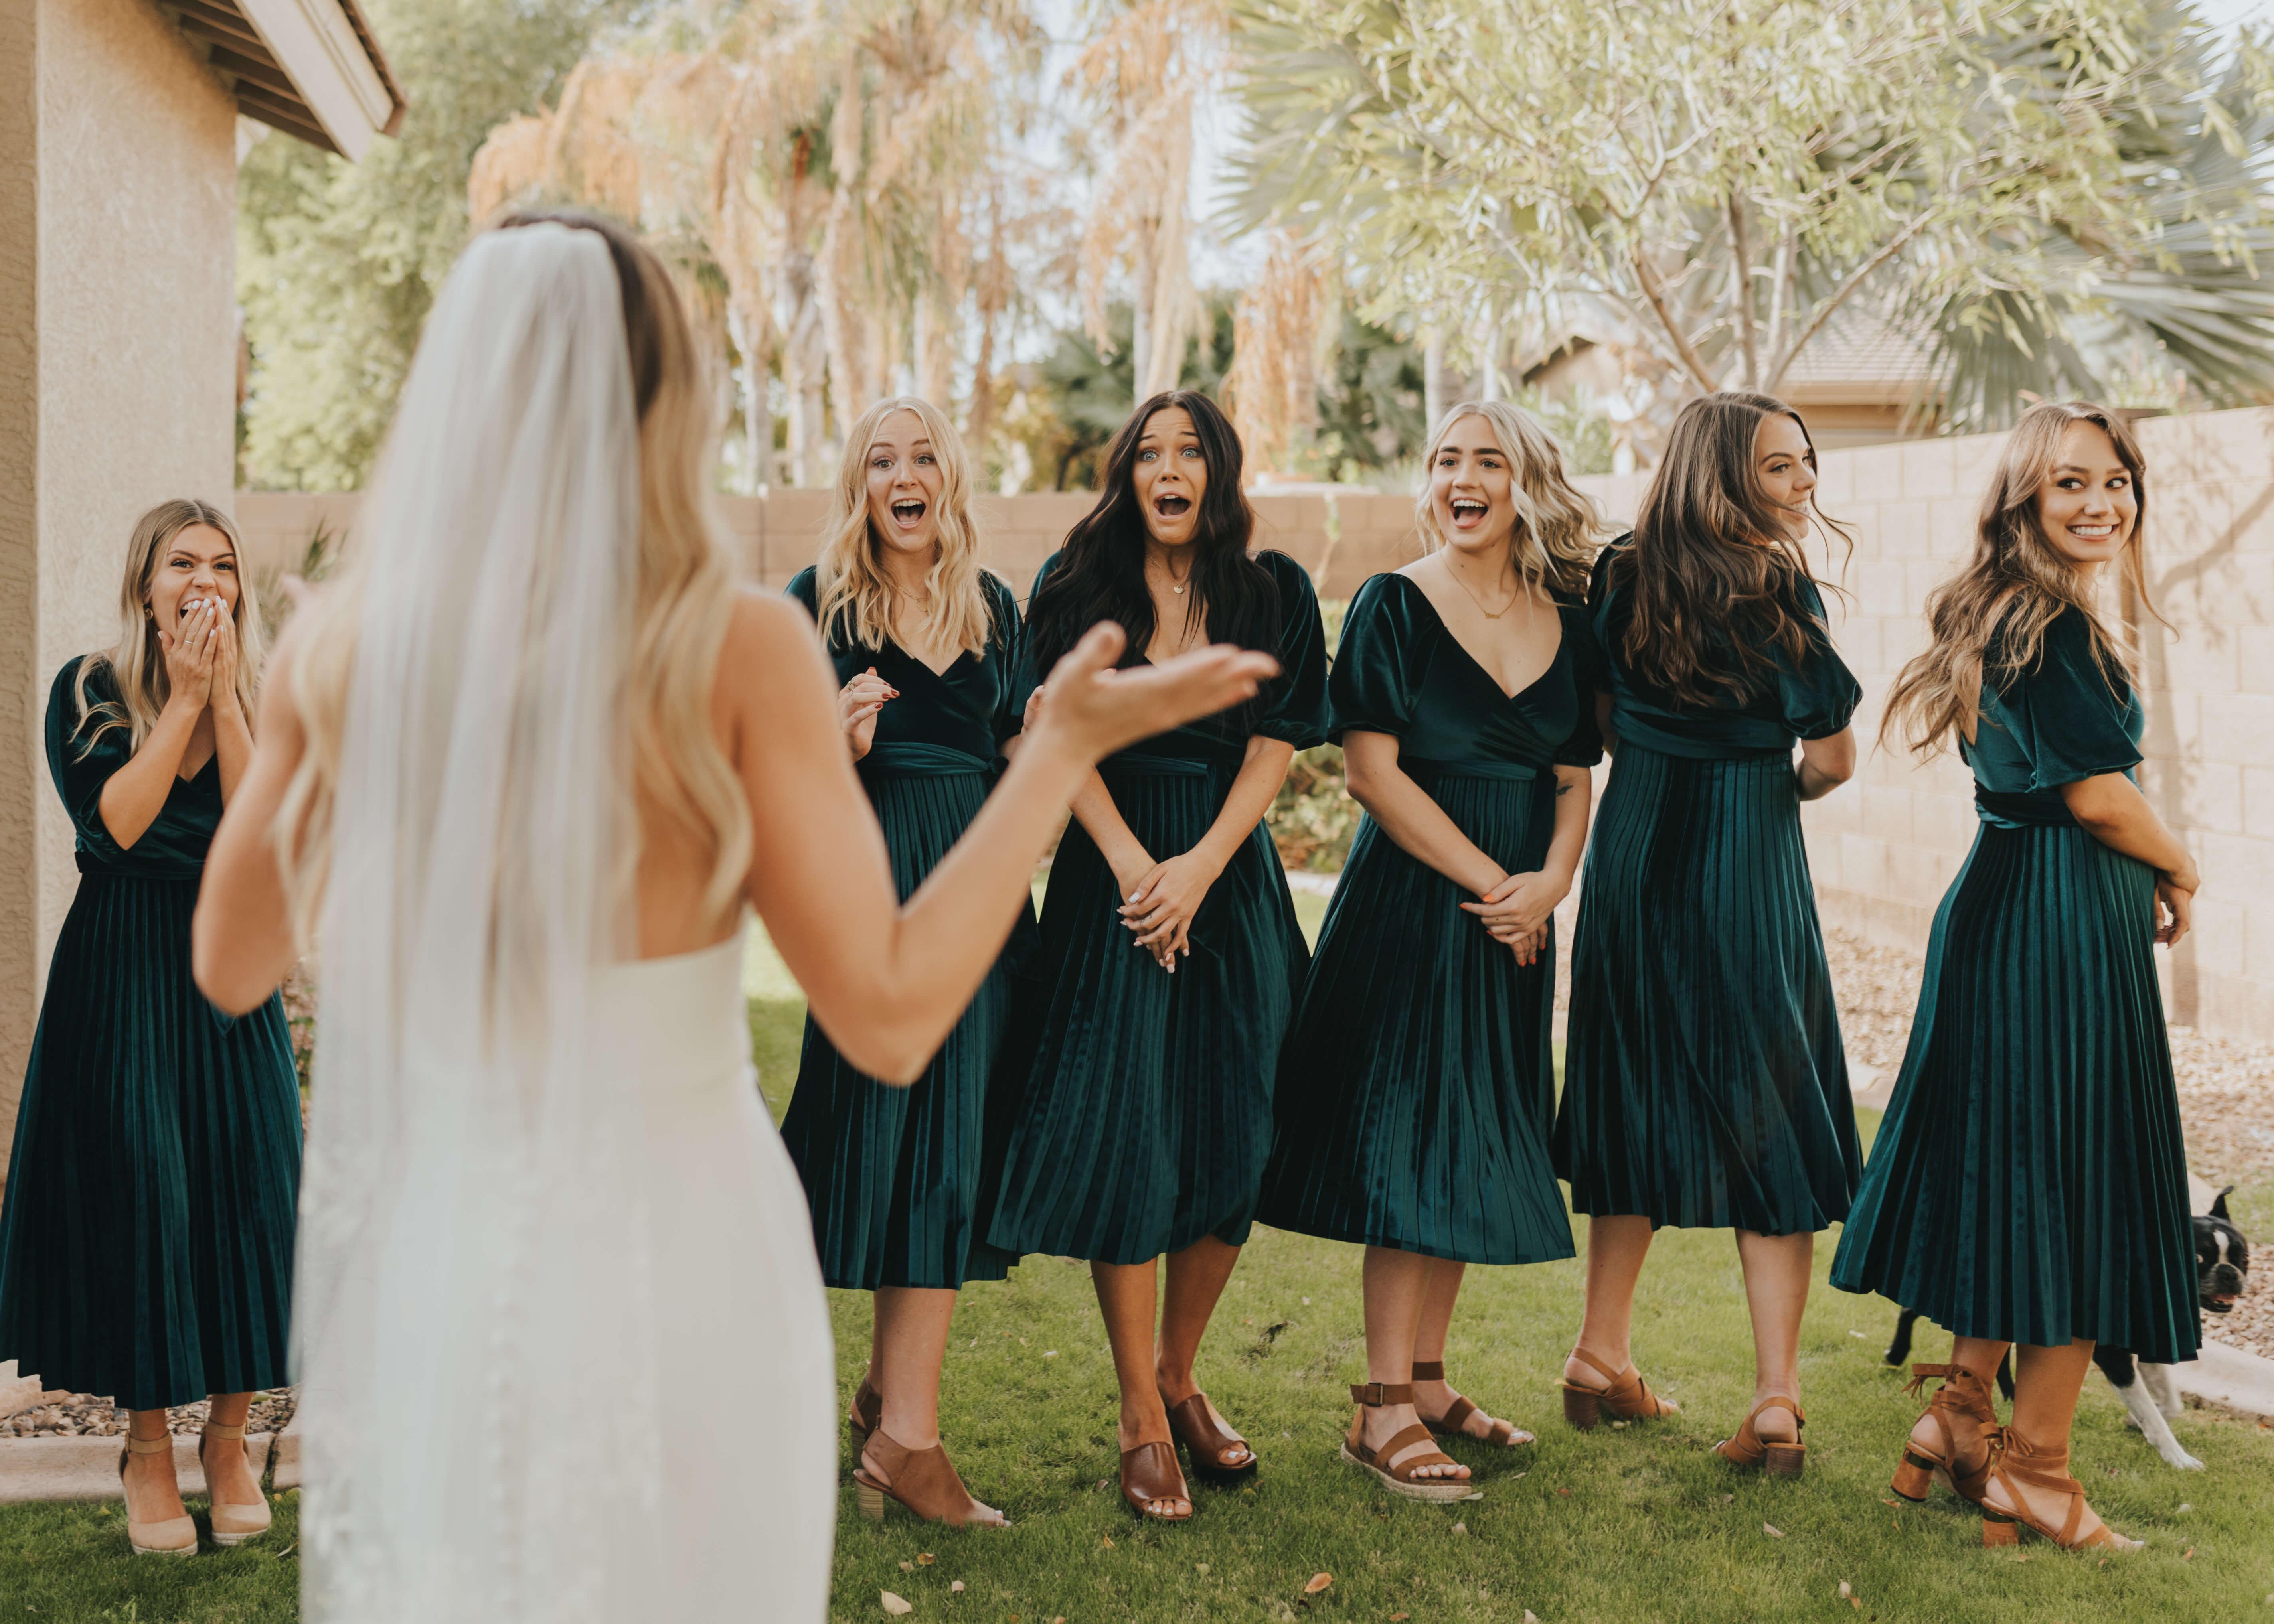 bridesmaid wedding dress reveal happy pictures